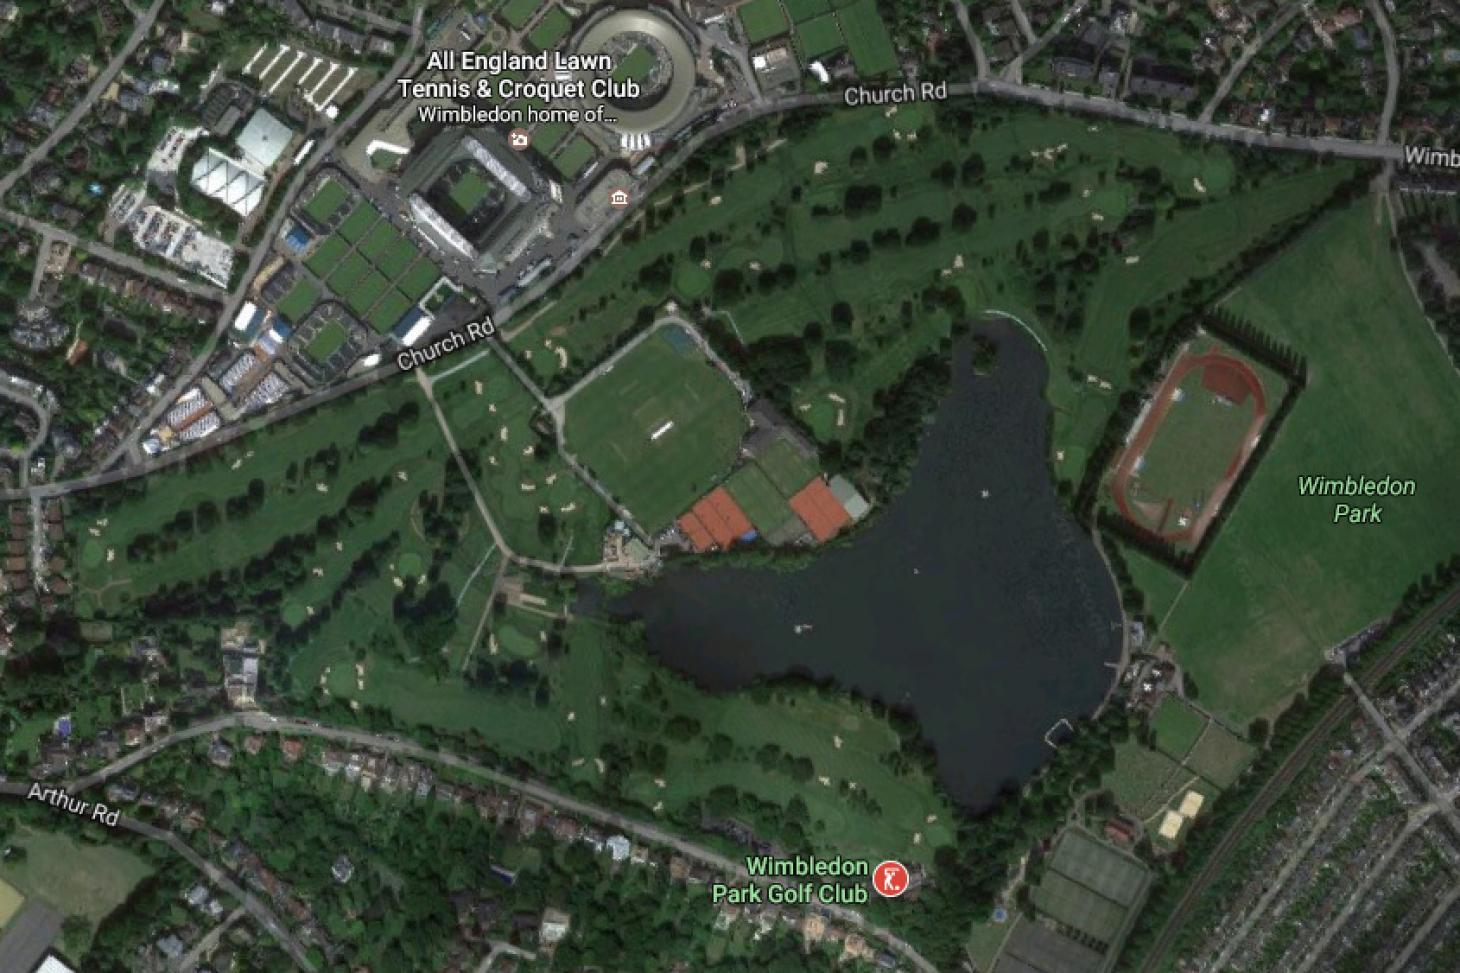 Wimbledon Park Golf Club 18 hole golf course